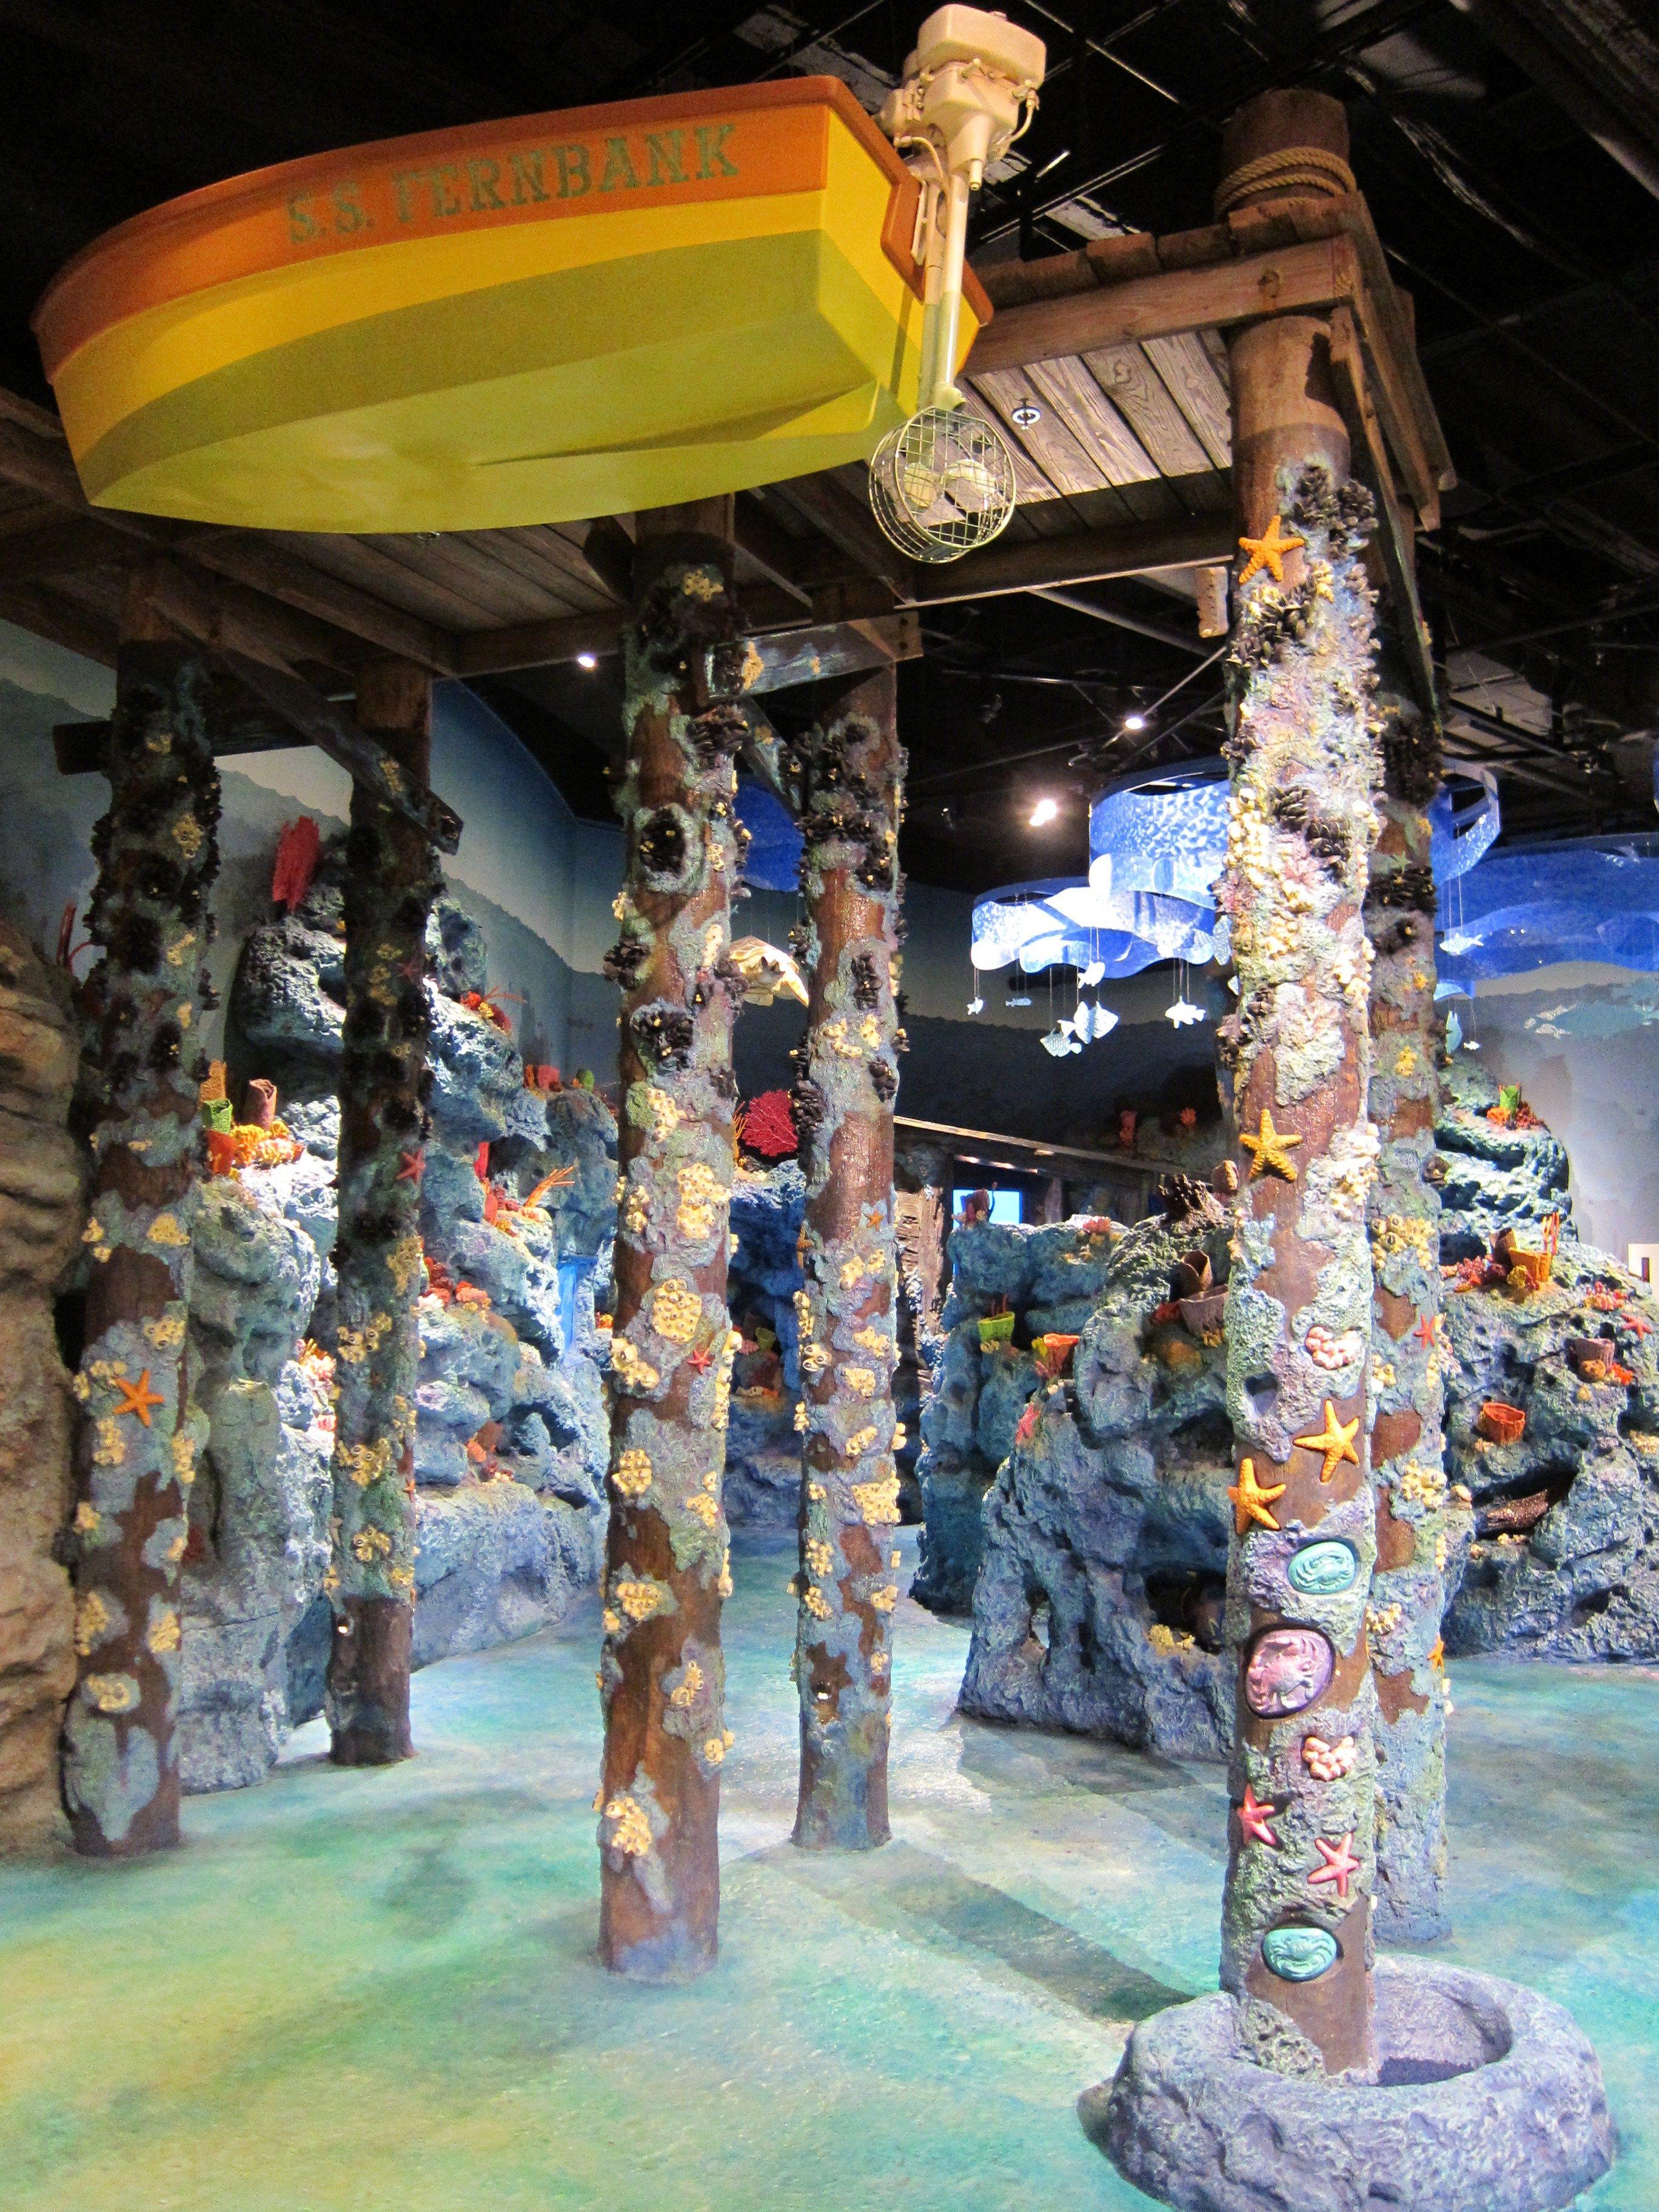 Indoor Playground In Atlanta At Fernbank Museum